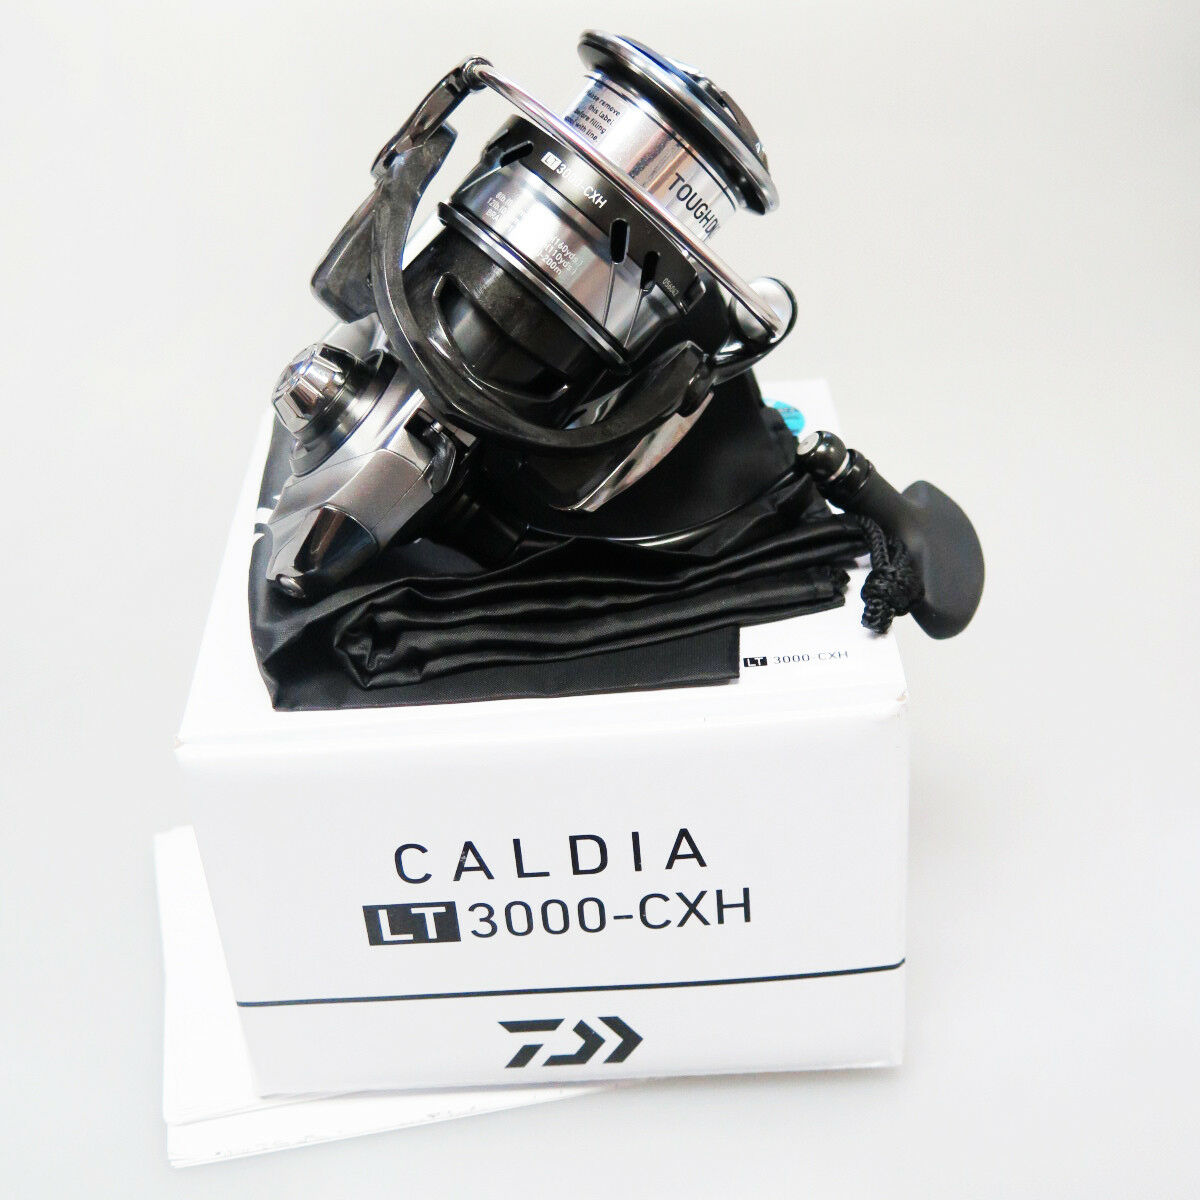 Nueva Luz 3000-CXH Spinning Cocheretes Daiwa Caldia 2DAY Prioridad FEDEX a EE. UU.